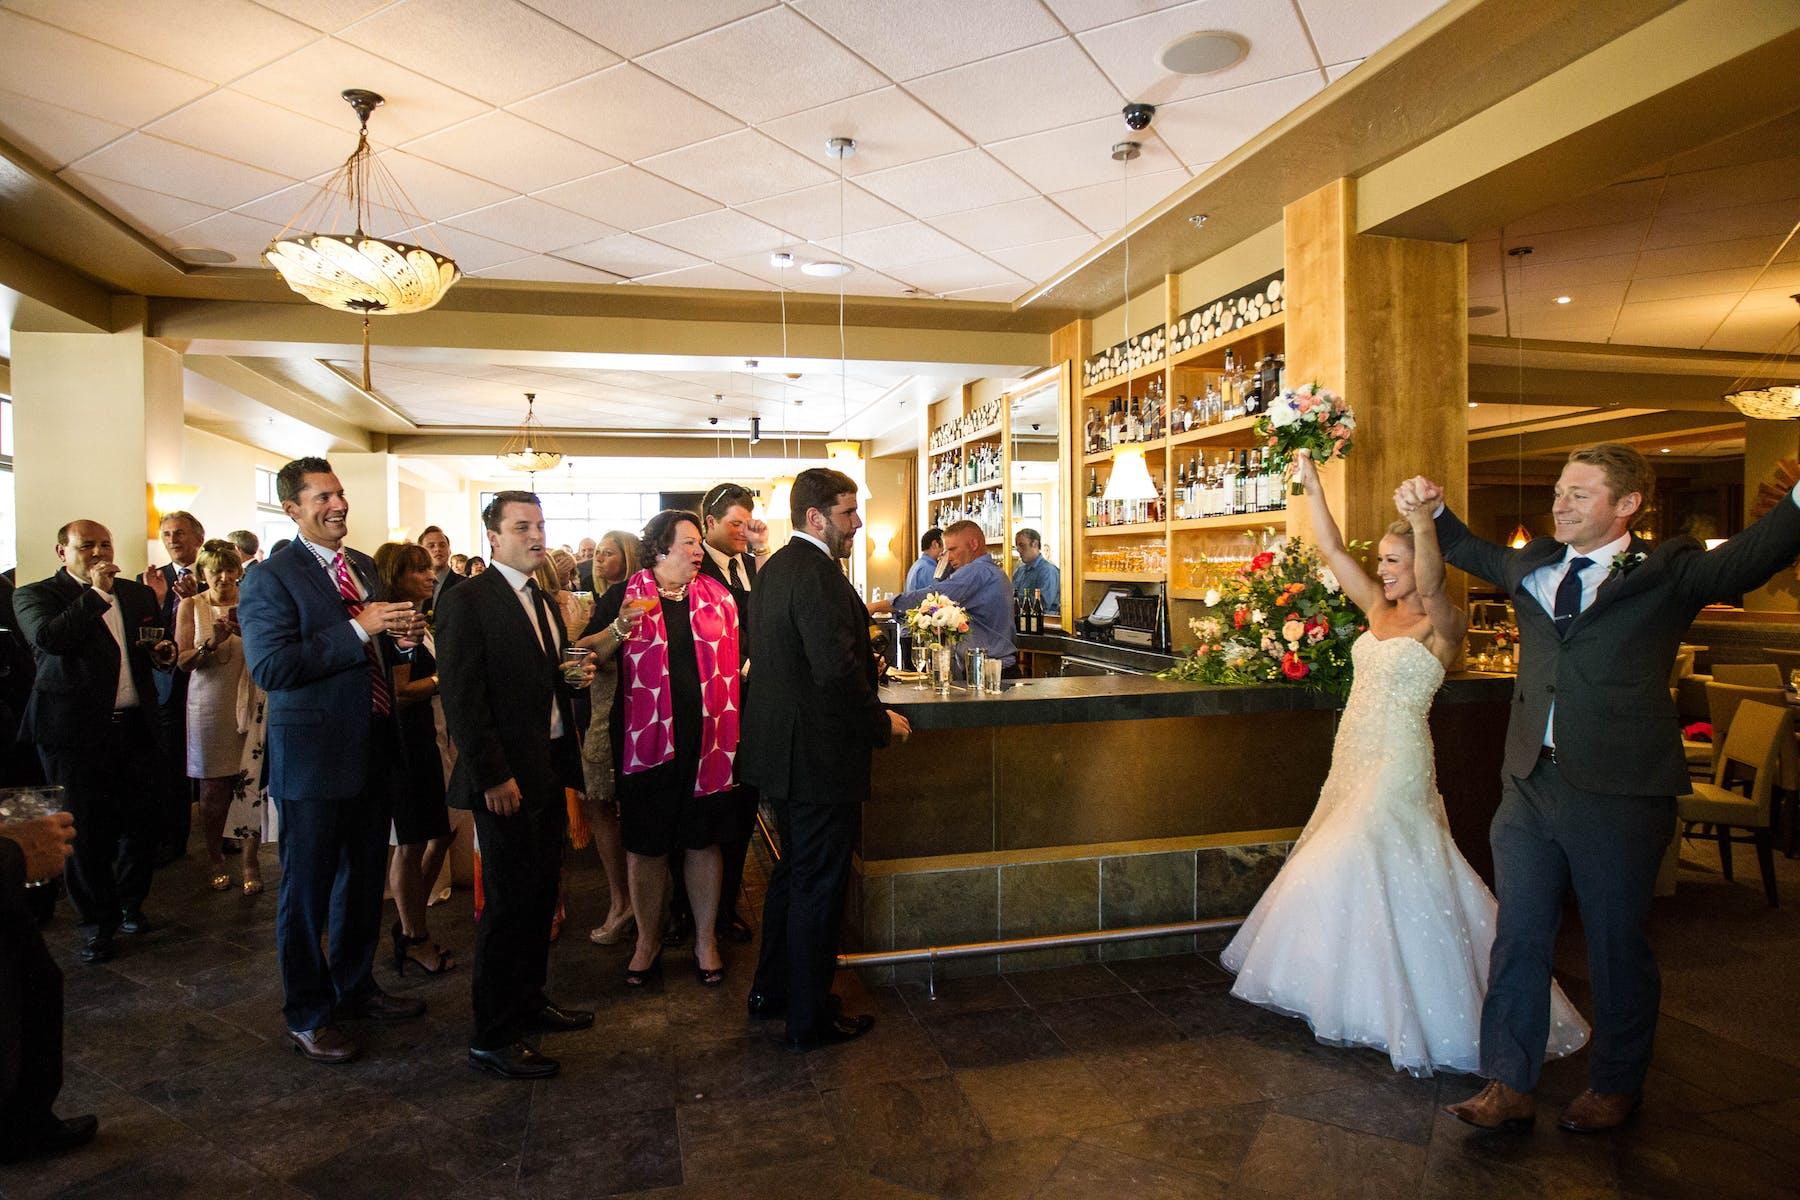 Larkspur Wedding Venue Vail Colorado Mountain Patio Outdoors Introduction